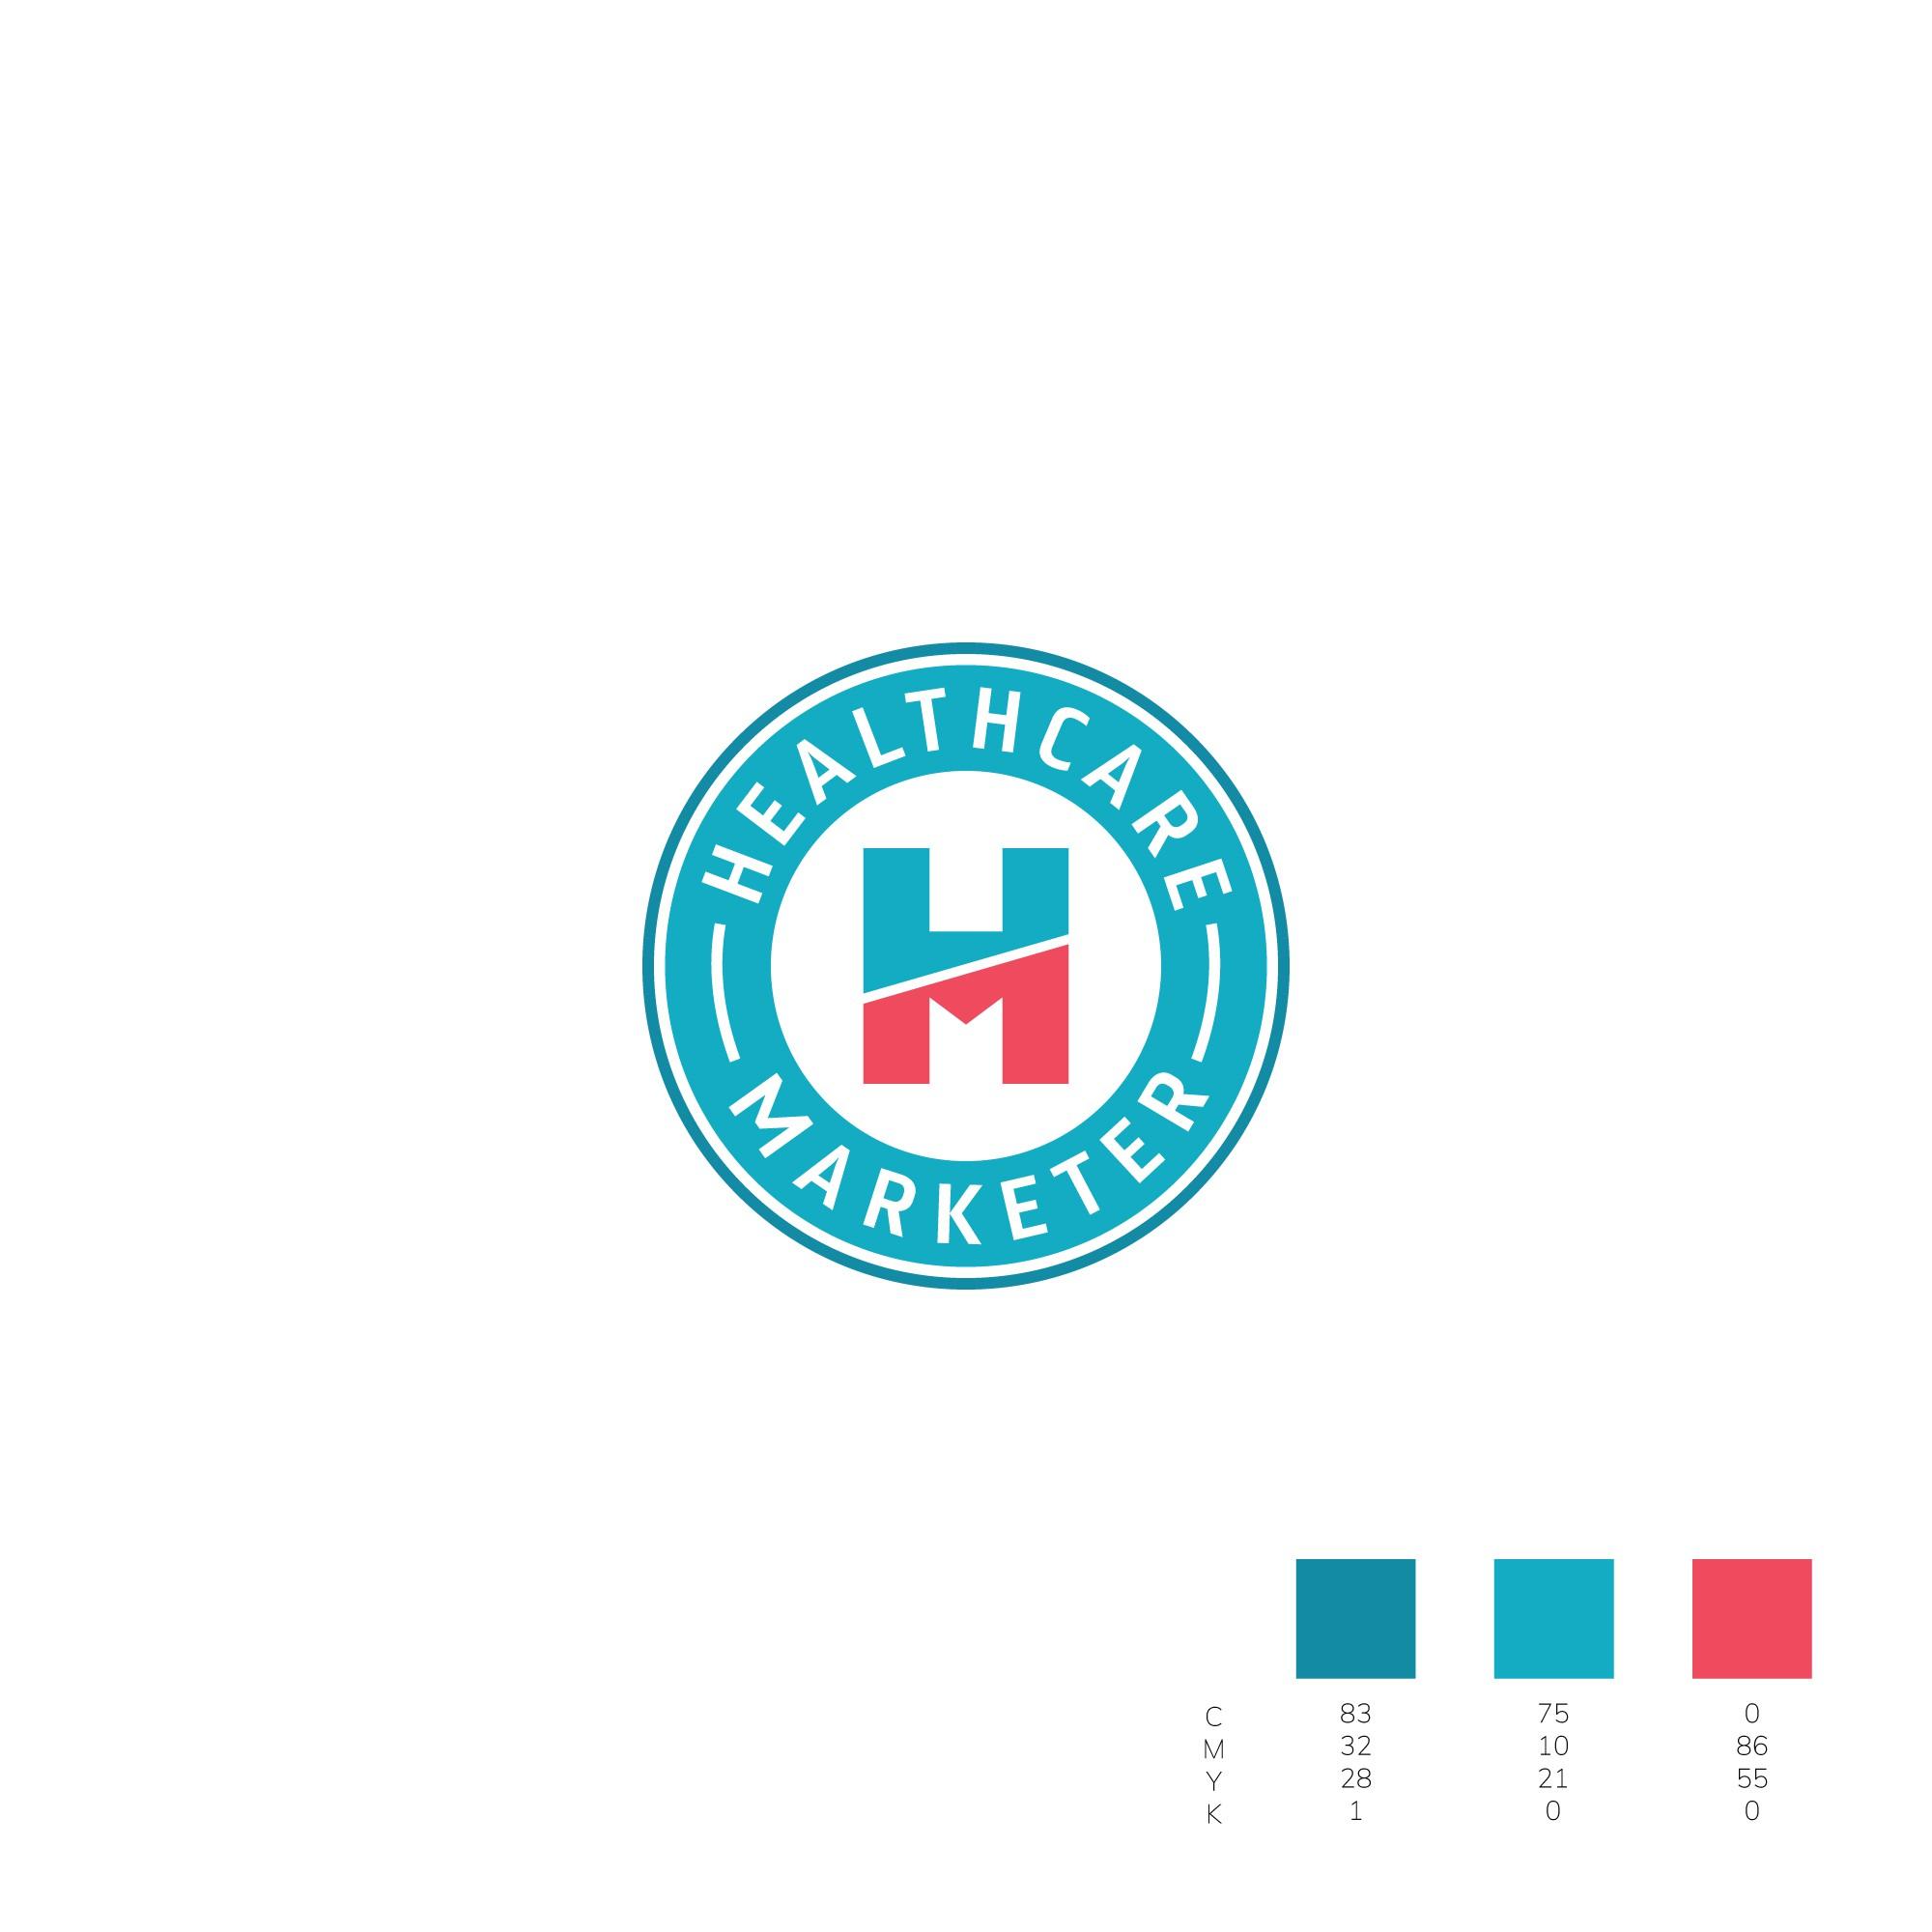 Badge-Based Healthcare Marketer Logo Design